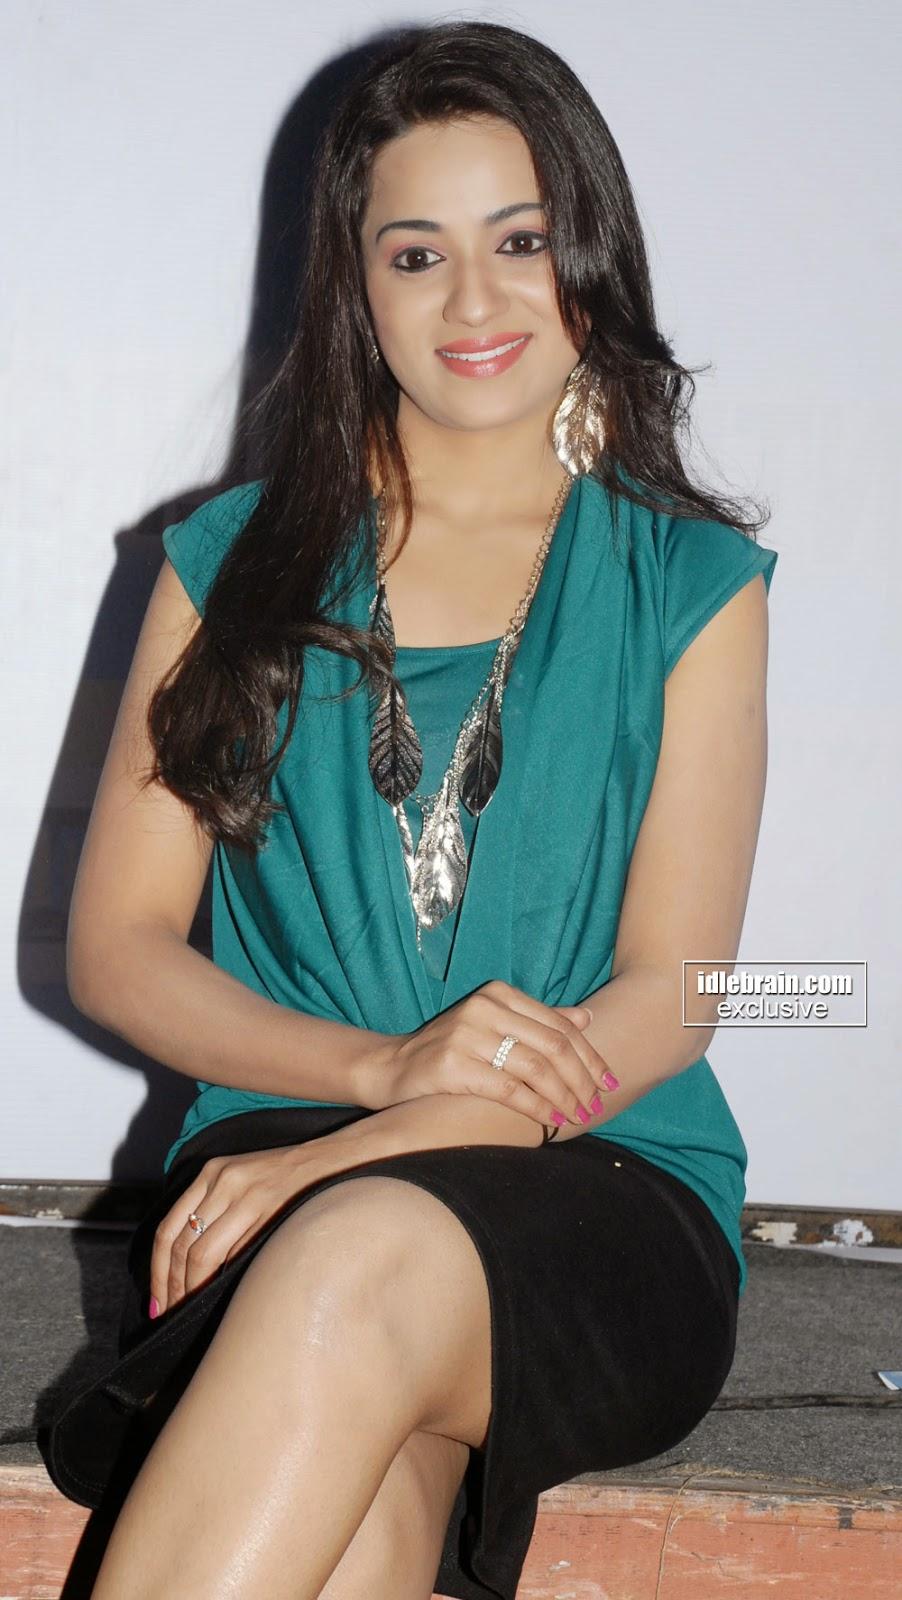 Reshma milky thigh n bare legs